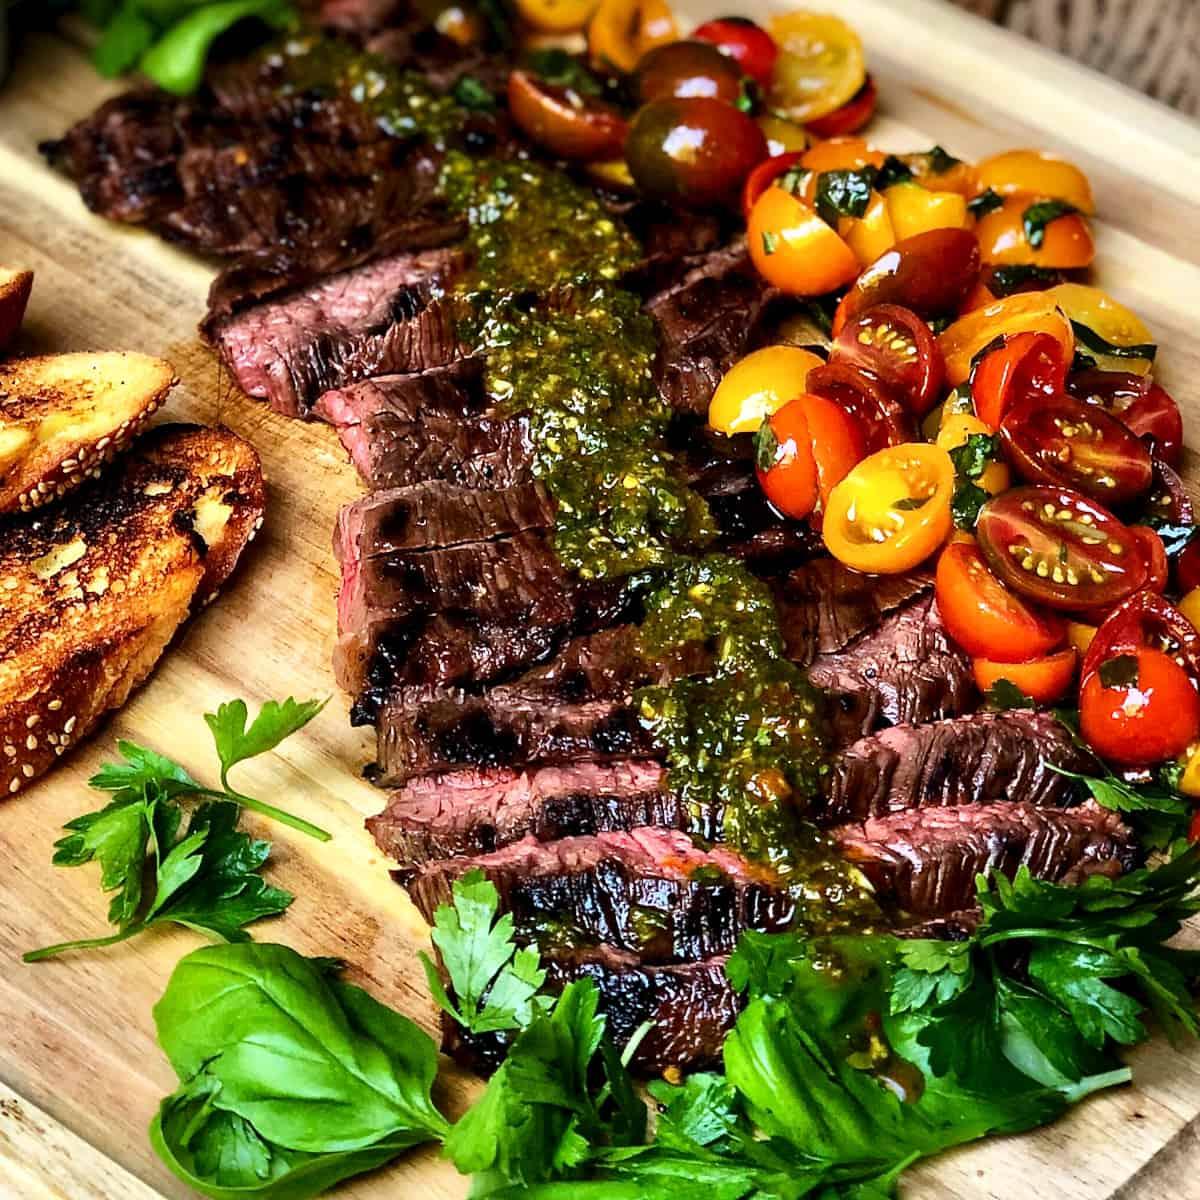 Grilled Skirt Steak with Italian Chimichurri and Tomato Salad